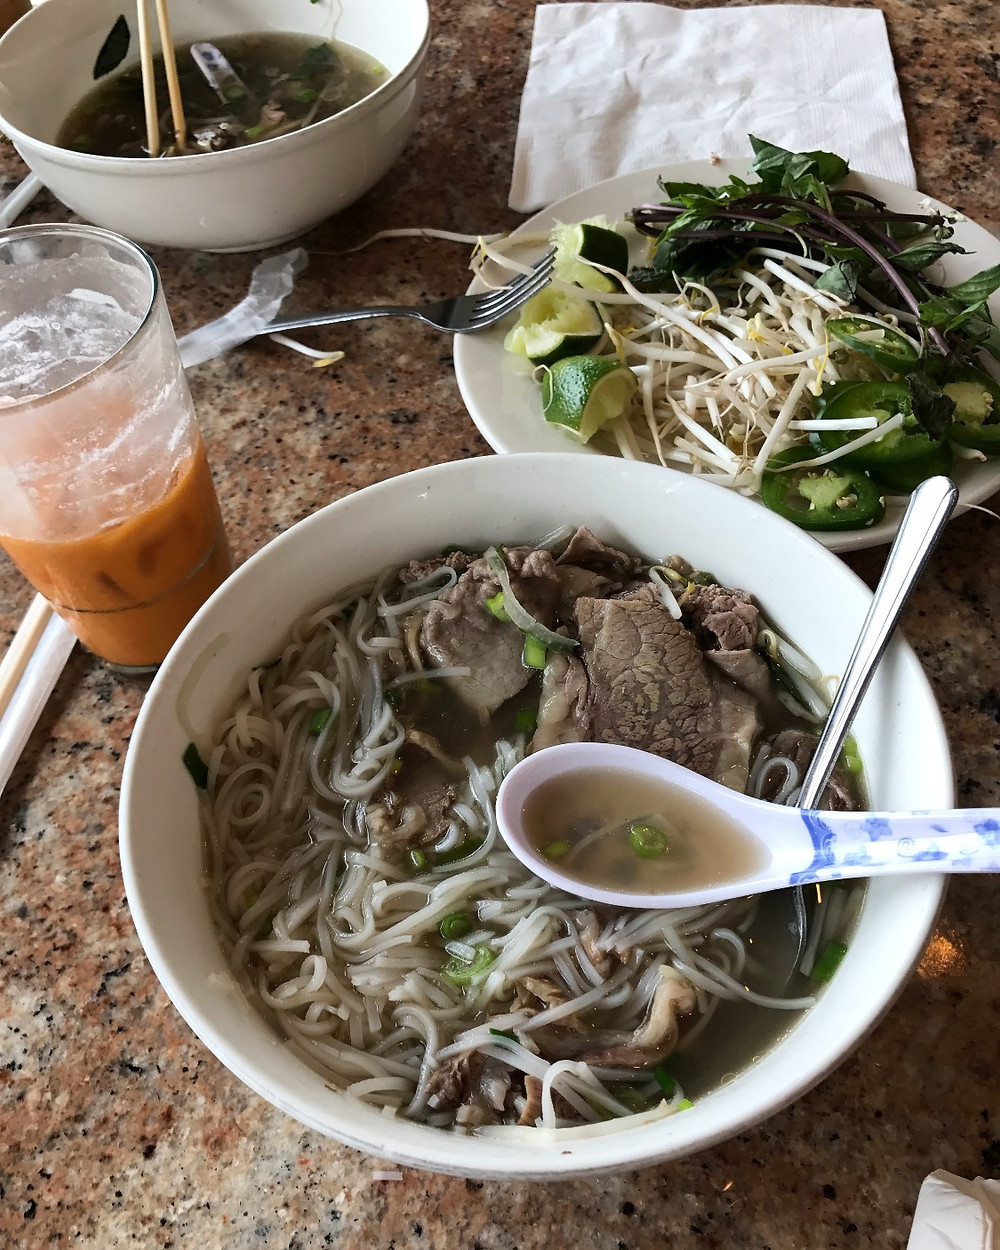 Pho-88-Orlando-Food-Mills-50-District-Orlando-Food-Blog-Katrina-Belle-Orlando-Blogger